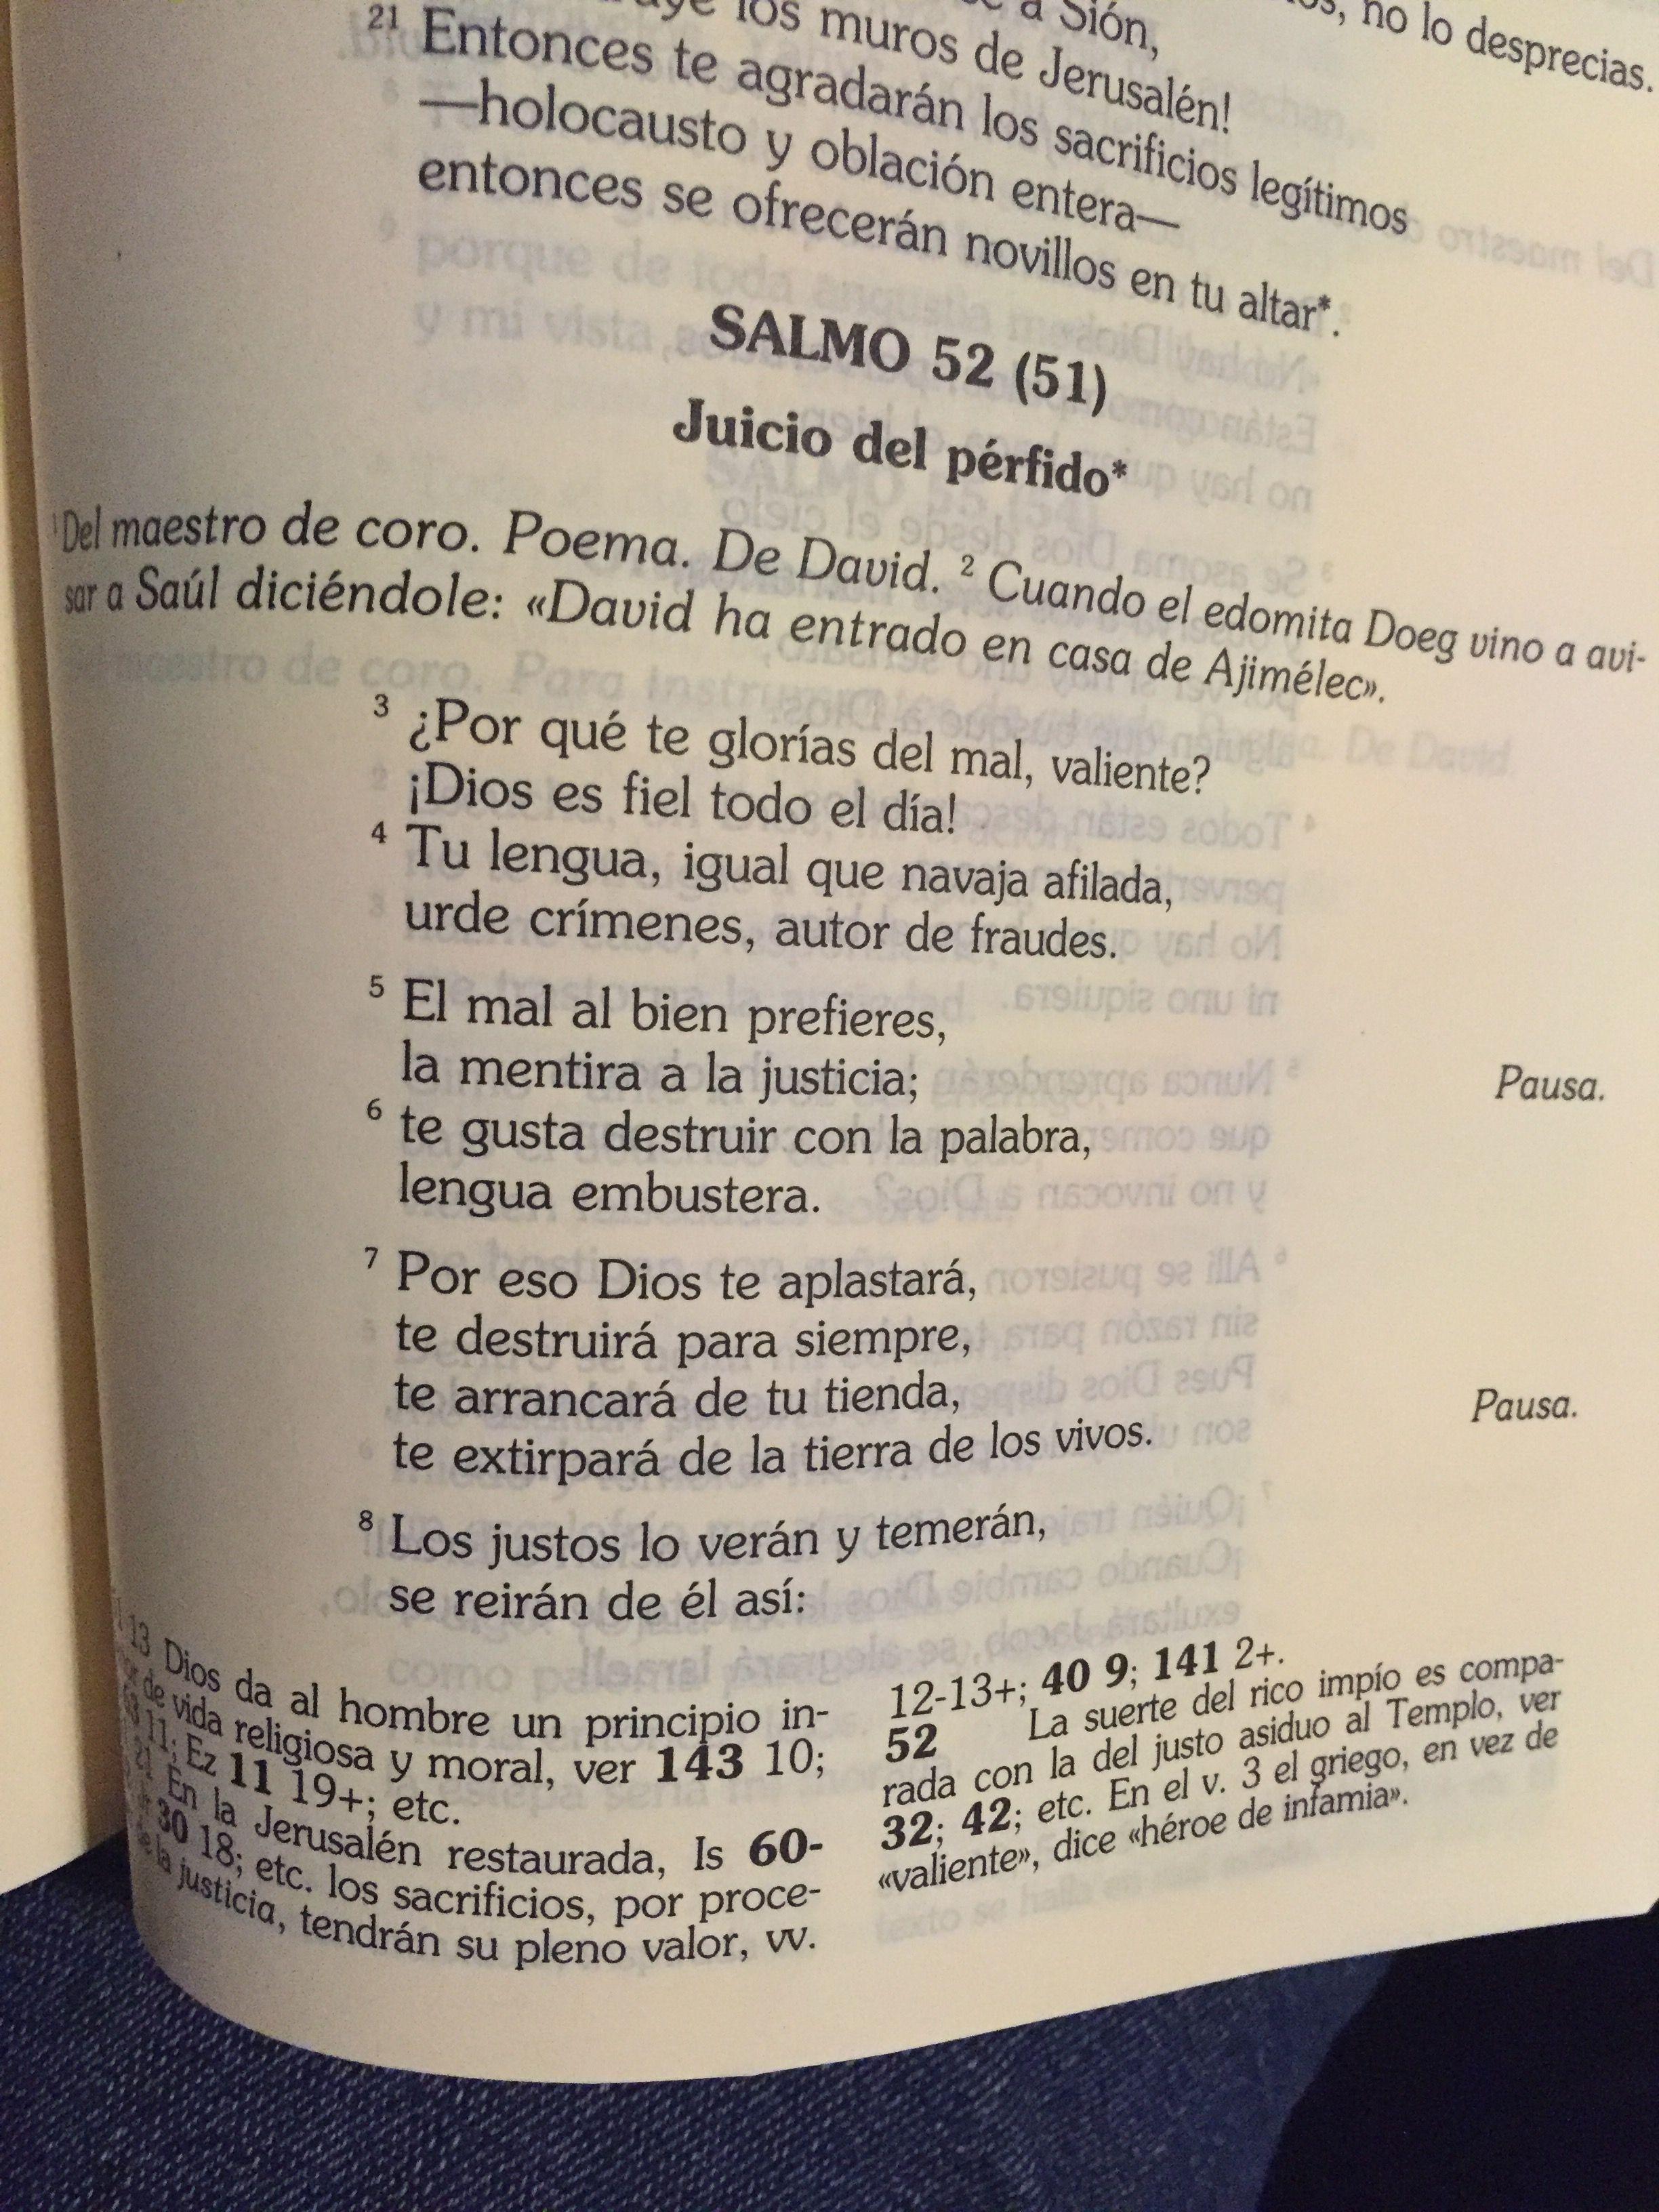 Salmo 52 Biblia Catolica | Ocity